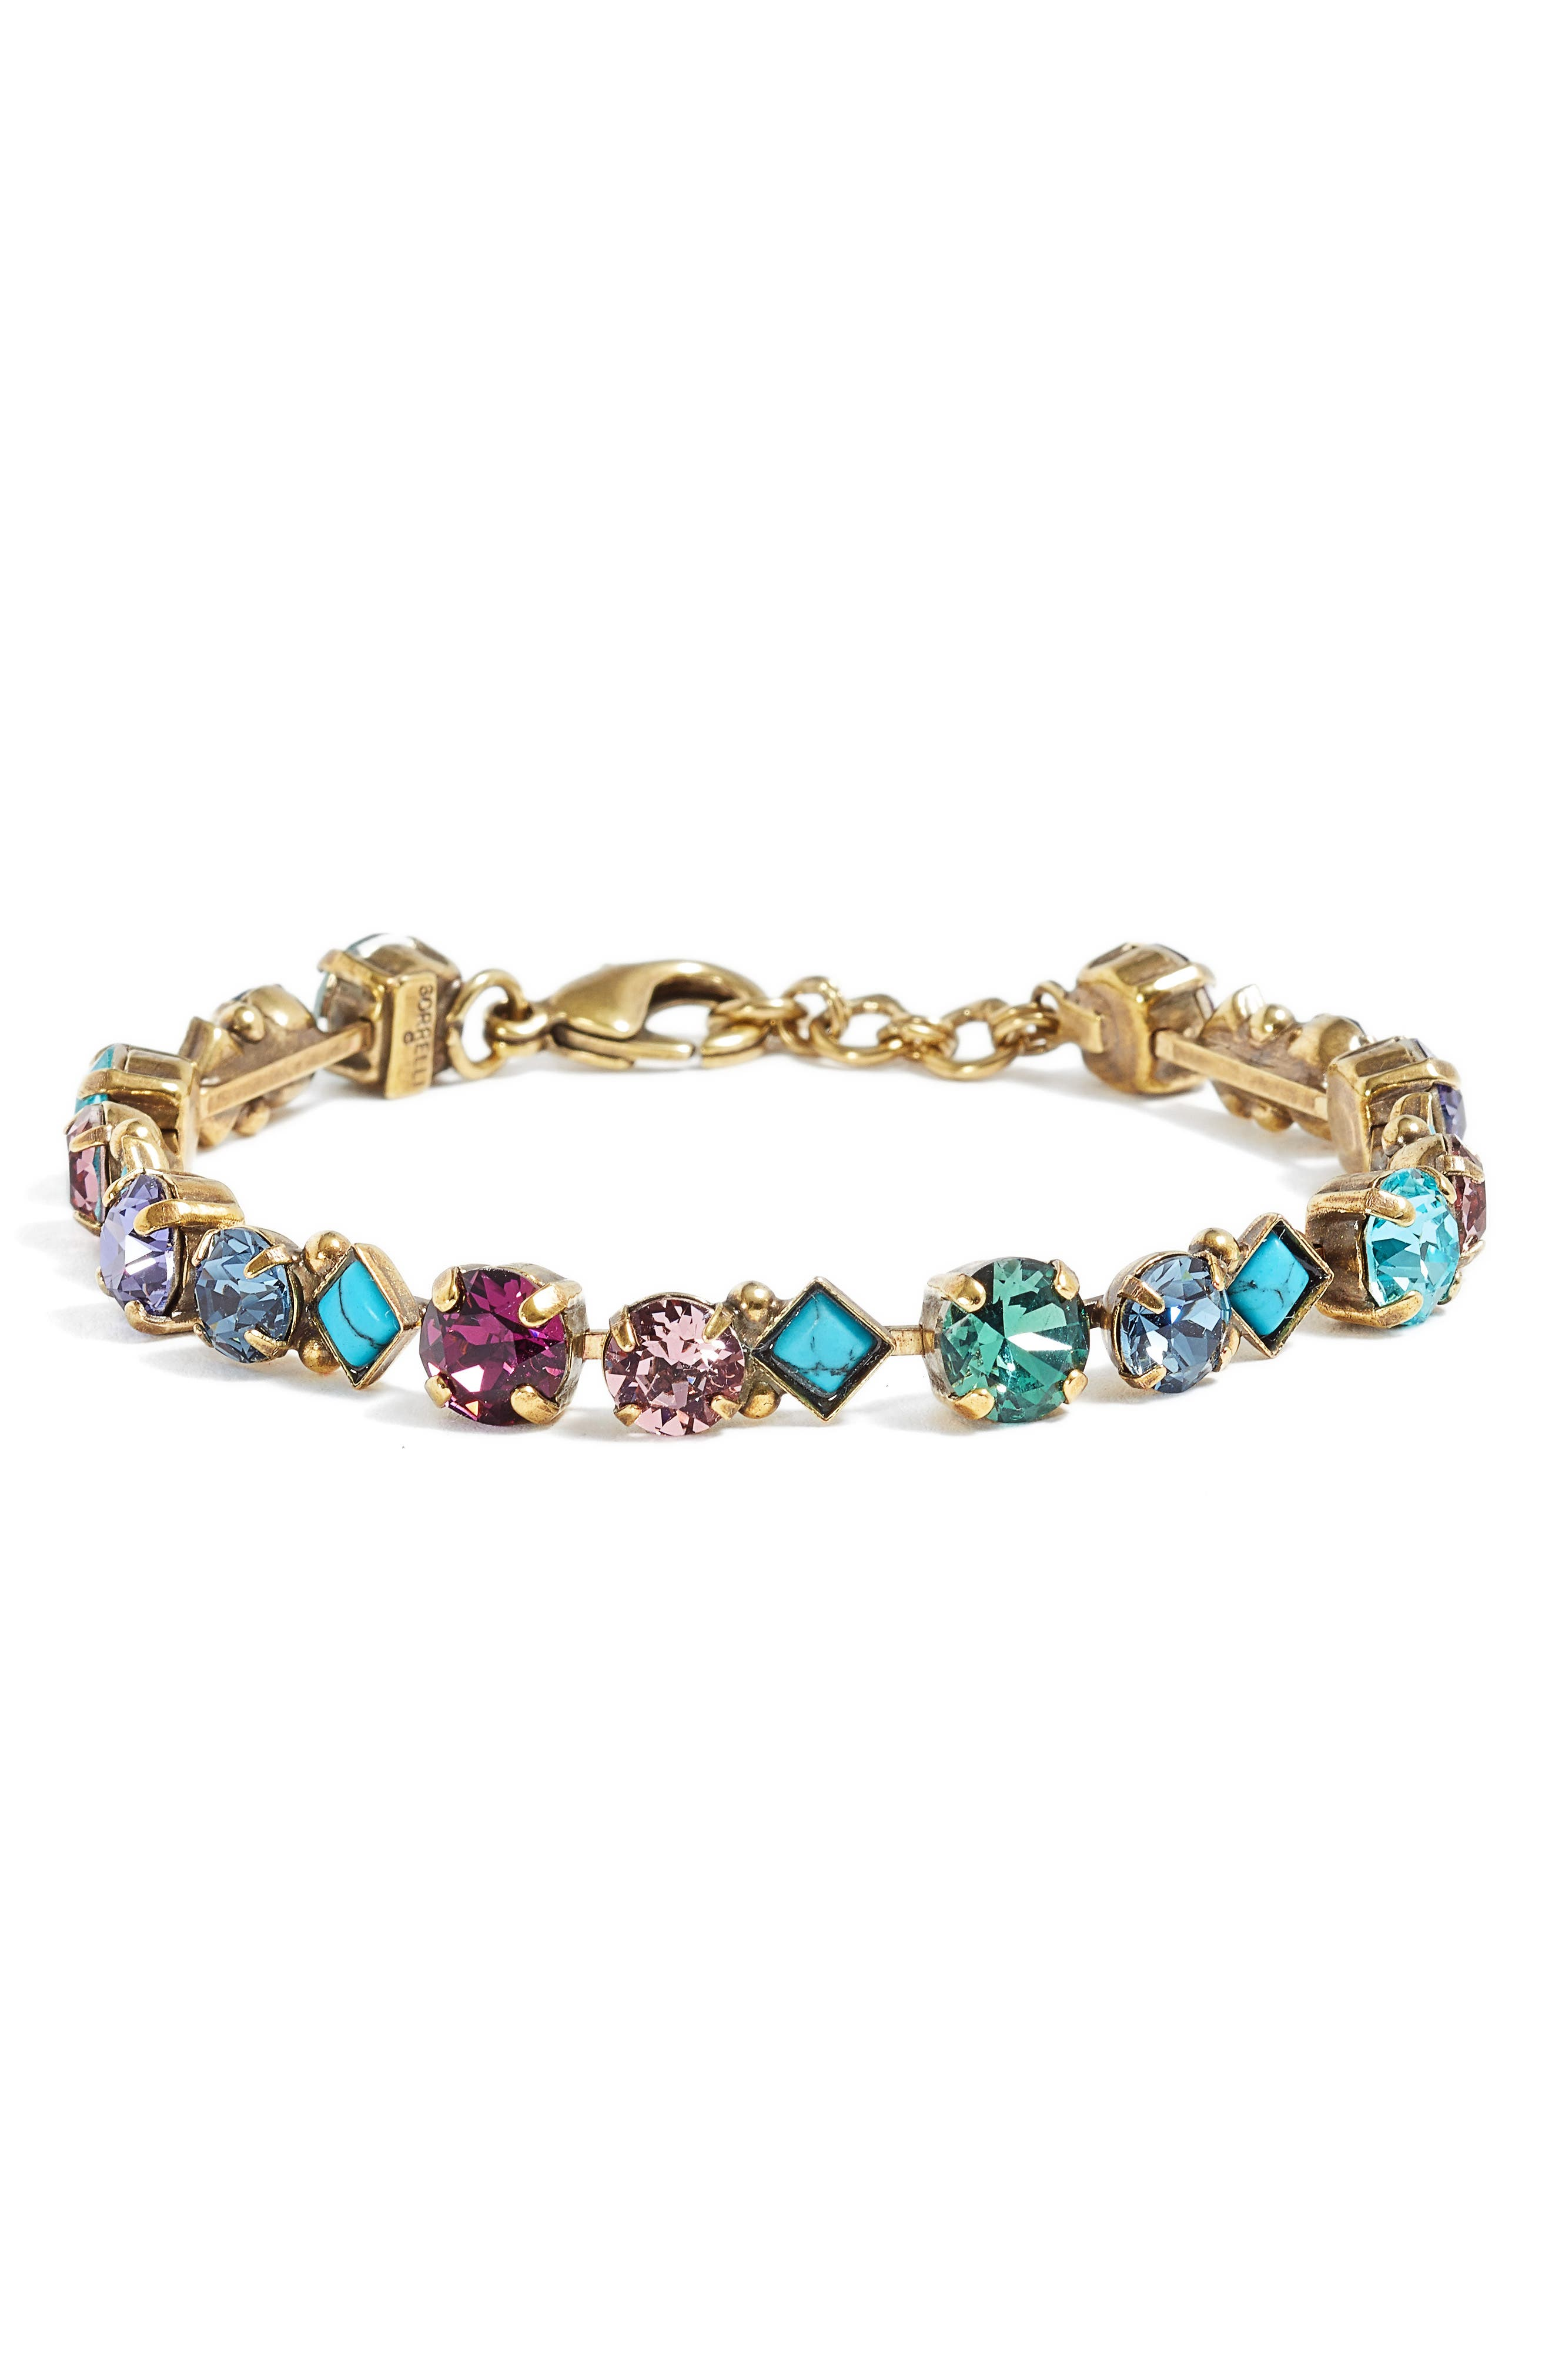 Darling Tennis Bracelet,                         Main,                         color, MULTI